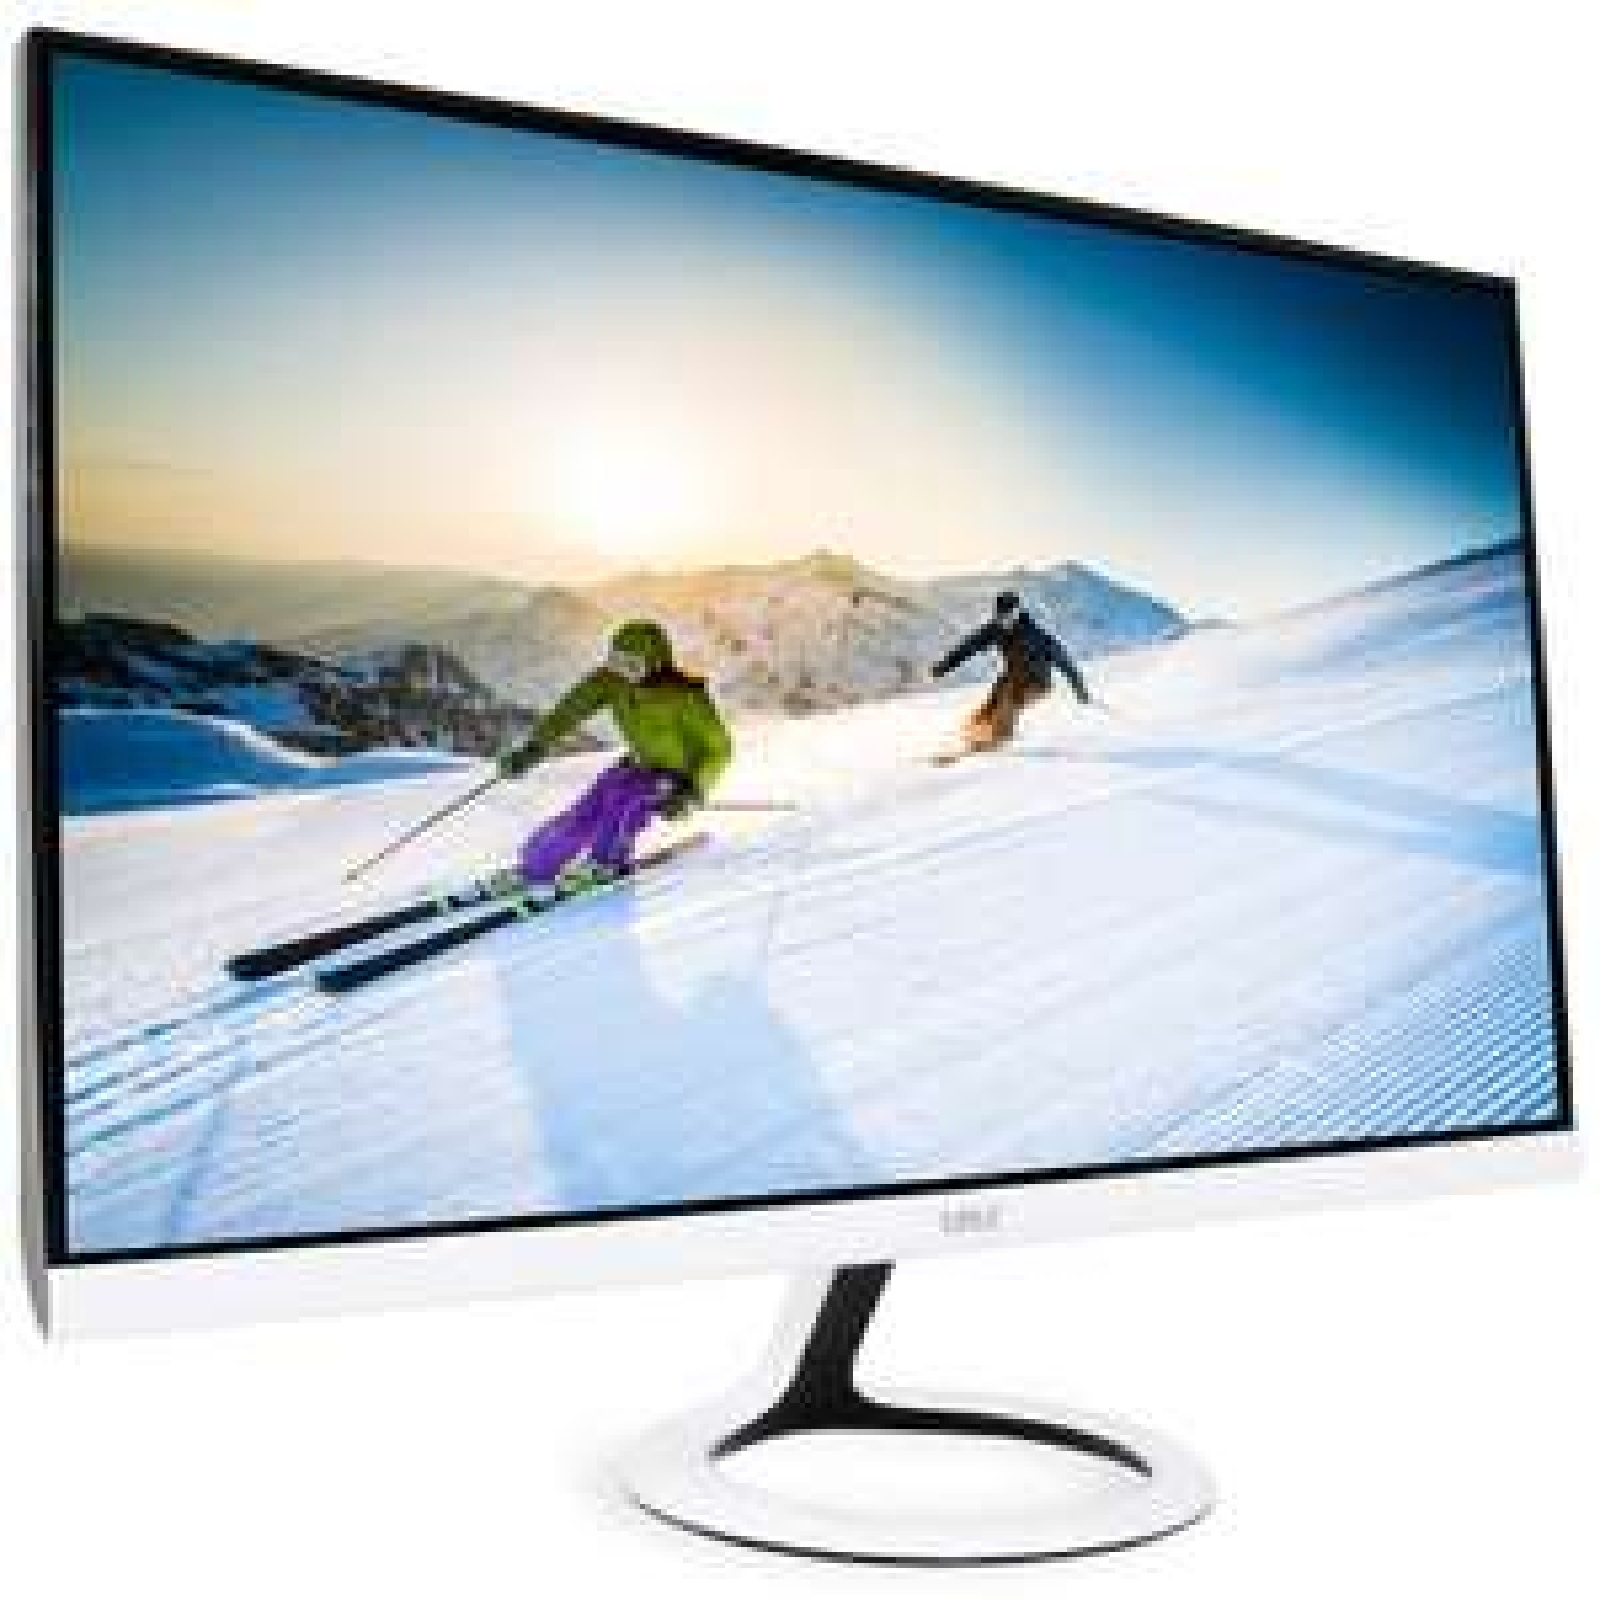 "Sélection de produits en Promotion - Ex: Ecran LED PC 23.6"" LDLC QS24+ (PLS Full HD, 5ms, VGA / HDMI)"